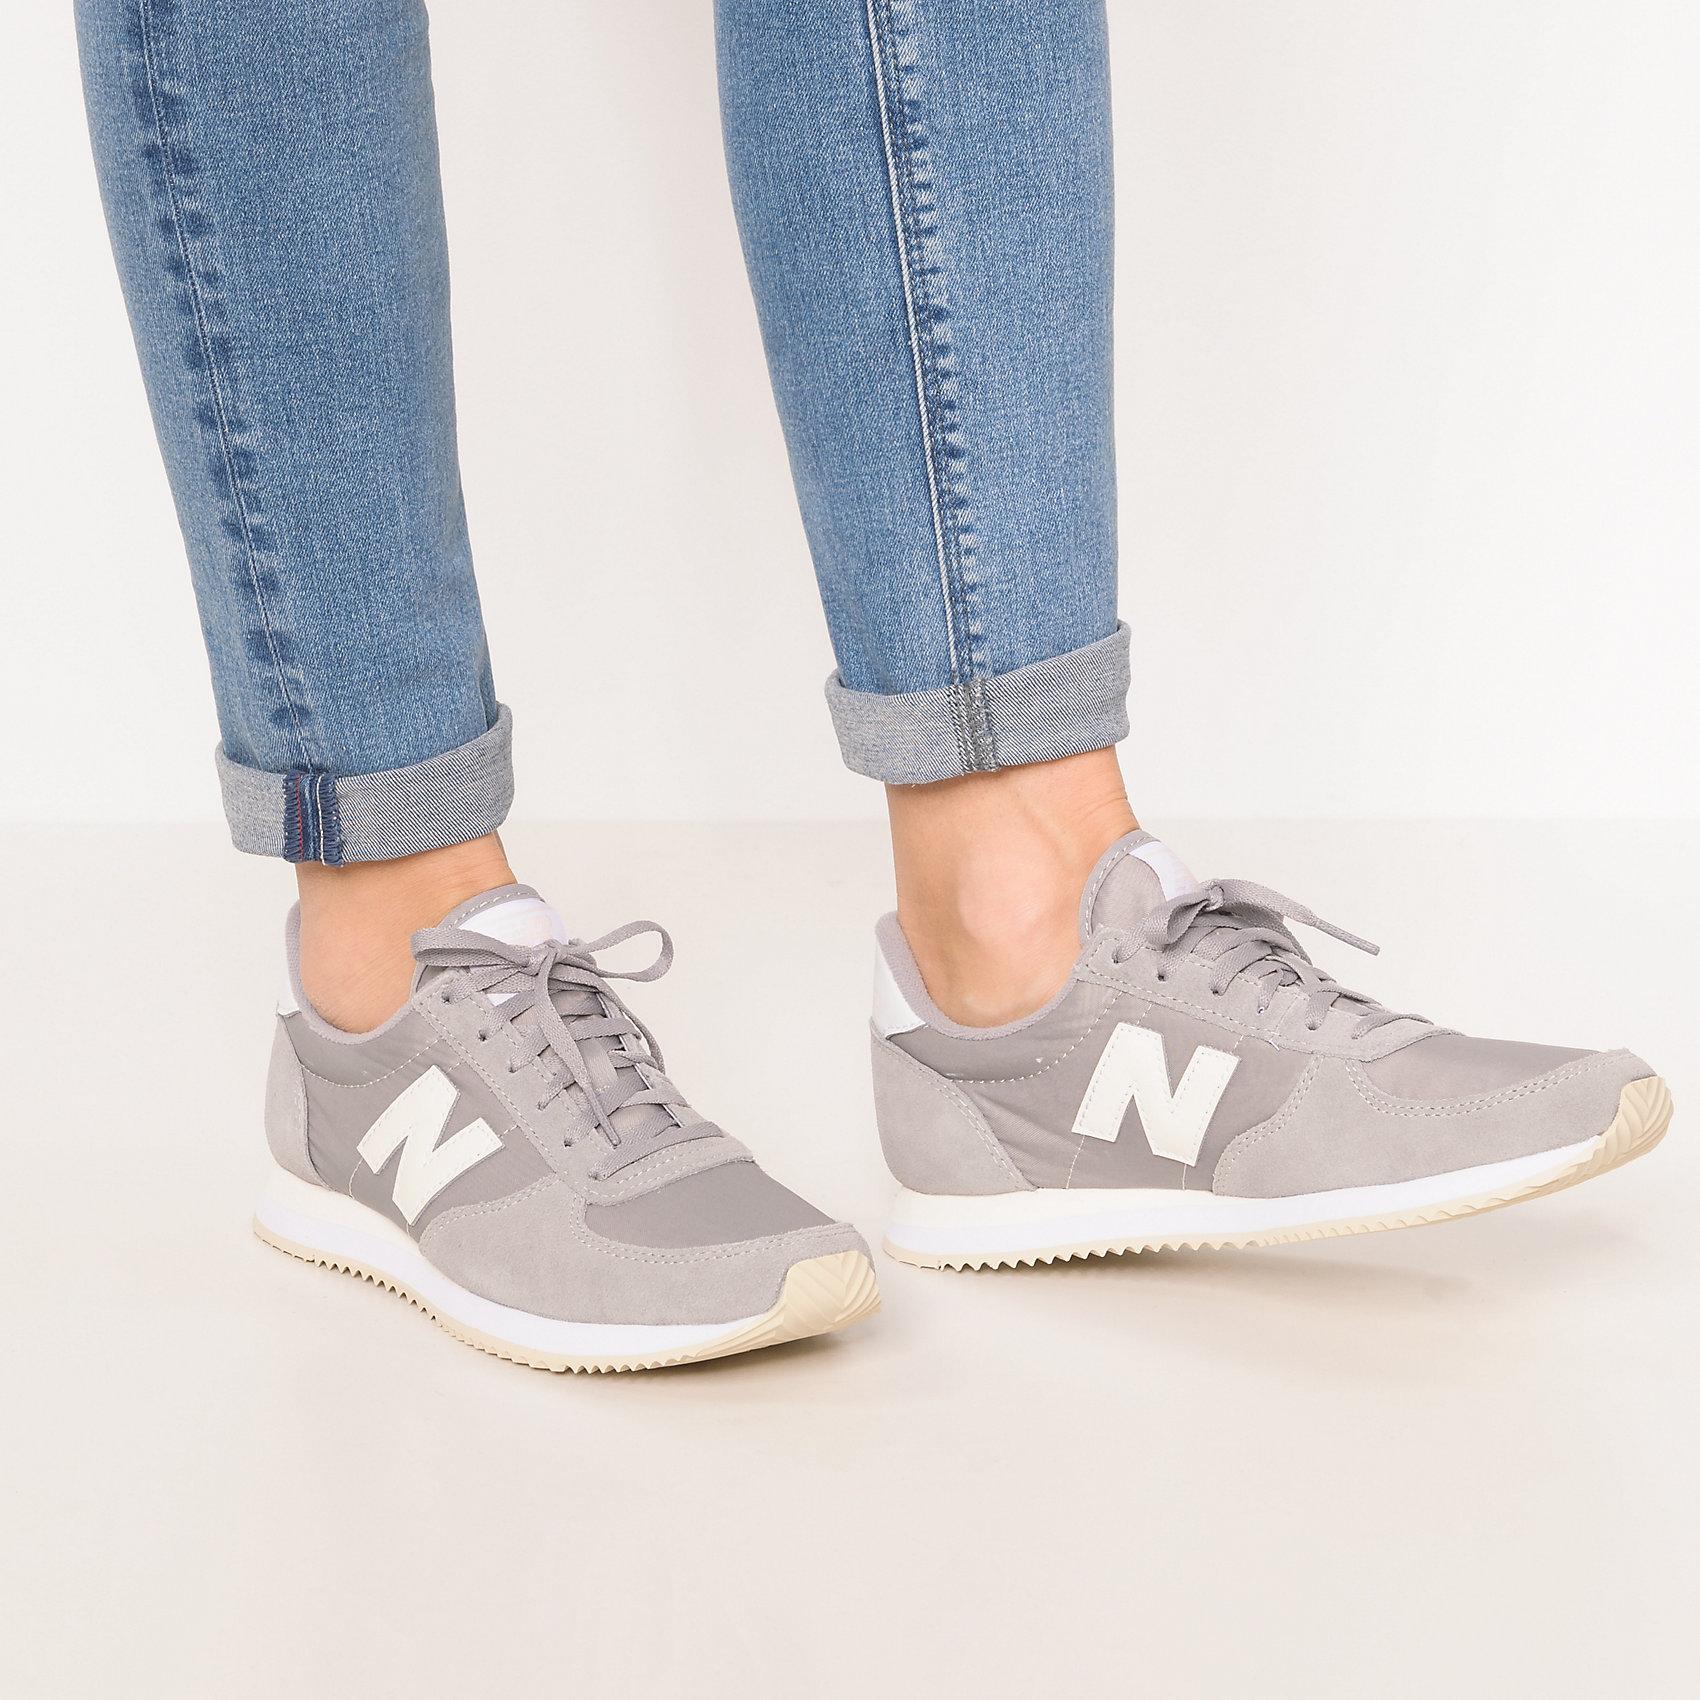 Neu Niedrig new balance WL220 B Sneakers Niedrig Neu 7397926 für Damen grau rosa ea8d99